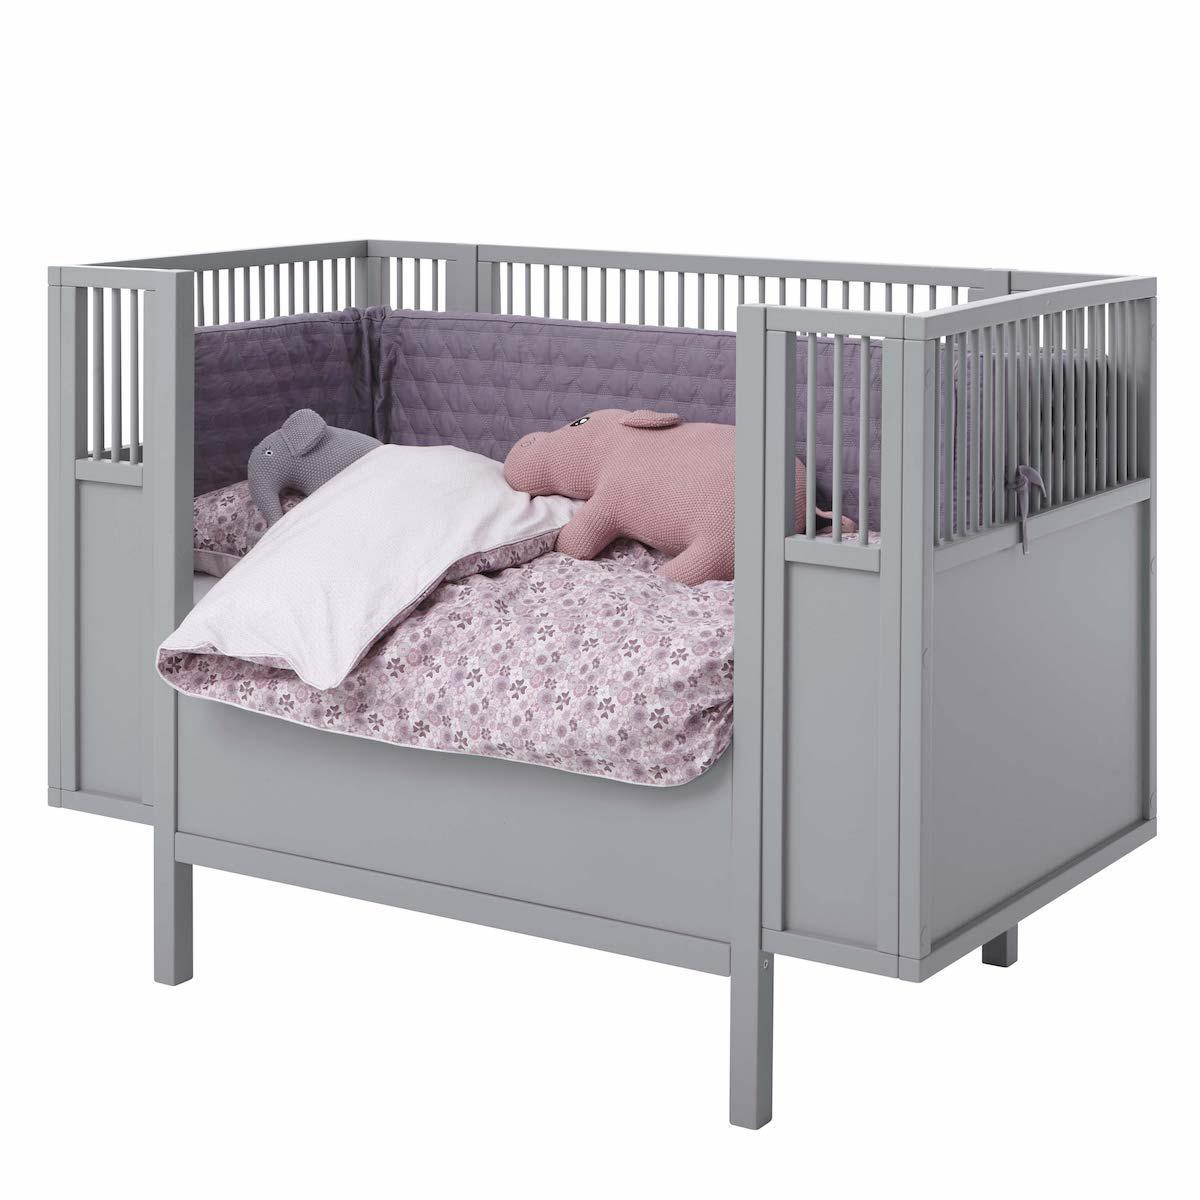 Barrera cama bebé 60x120cm Lifetime gris